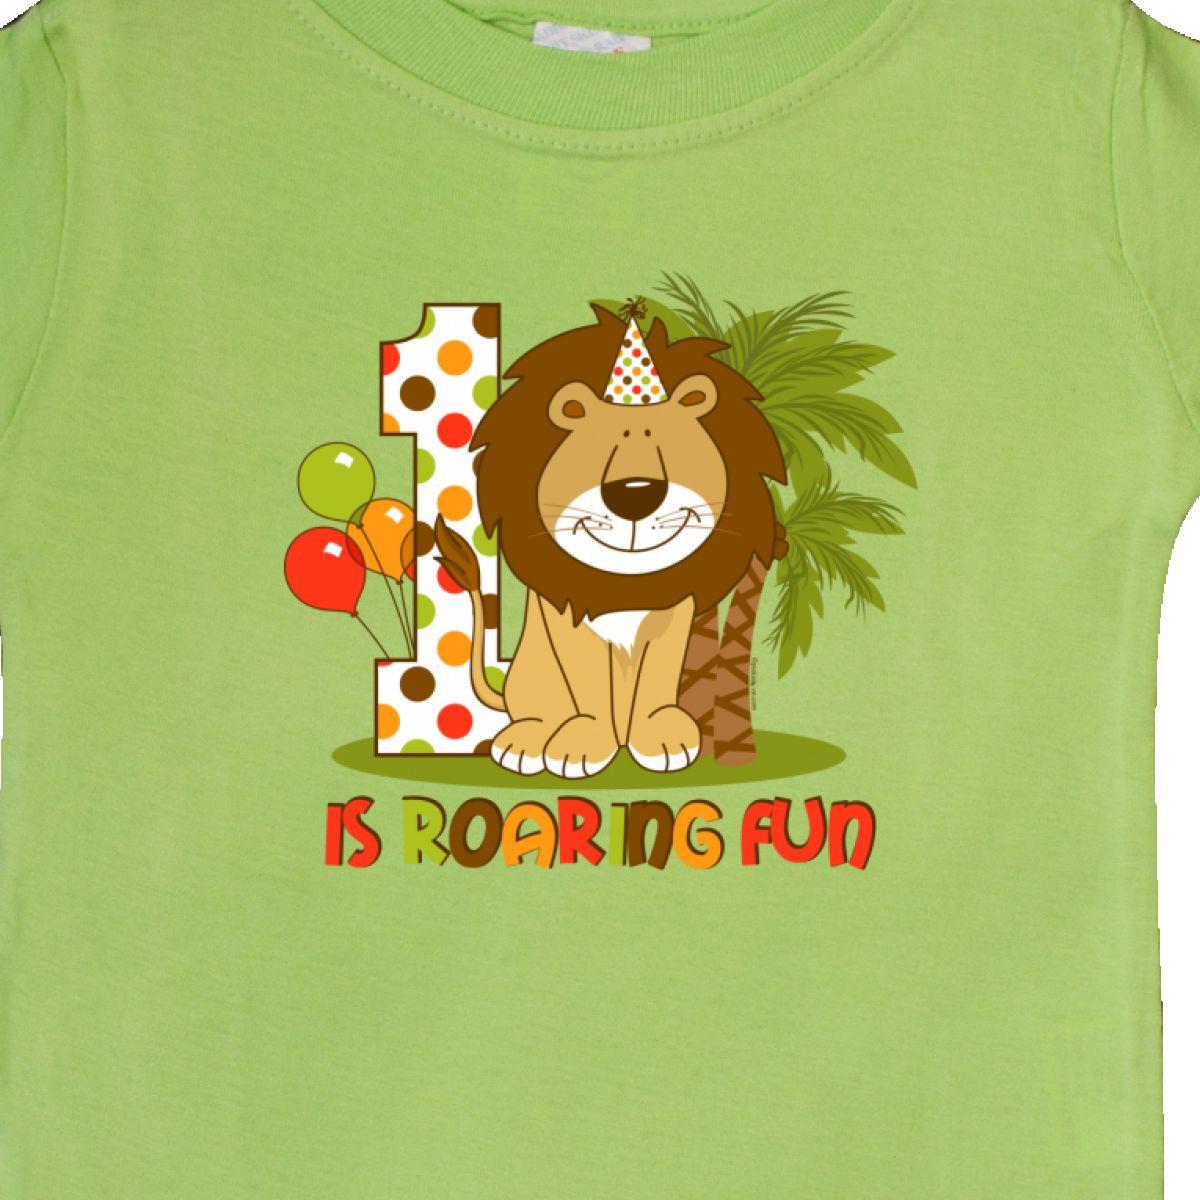 Inktastic-Cute-Lion-1st-Birthday-Baby-T-Shirt-Roaring-Fun-Pinkinkartkids-First thumbnail 10